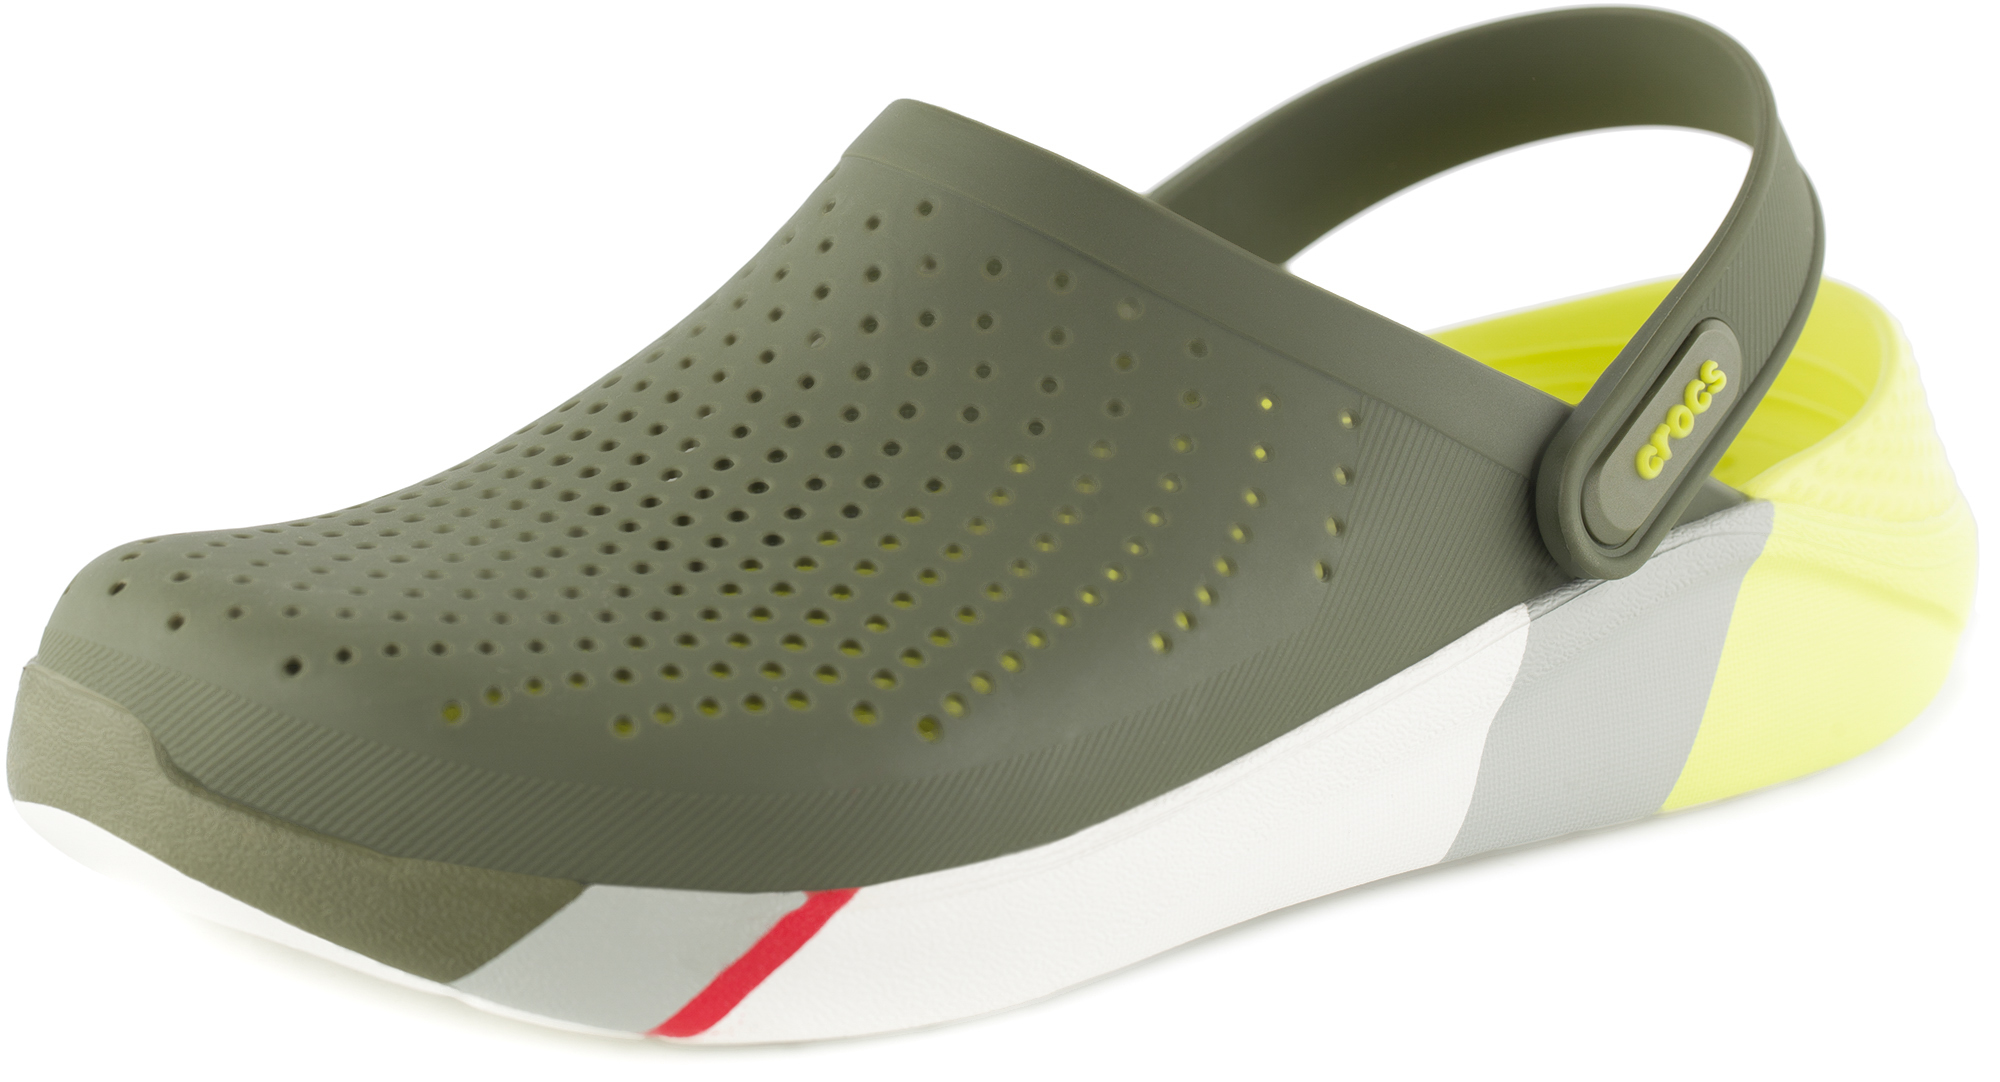 цена на Crocs Шлепанцы Crocs LiteRide Colorblock, размер 44-45